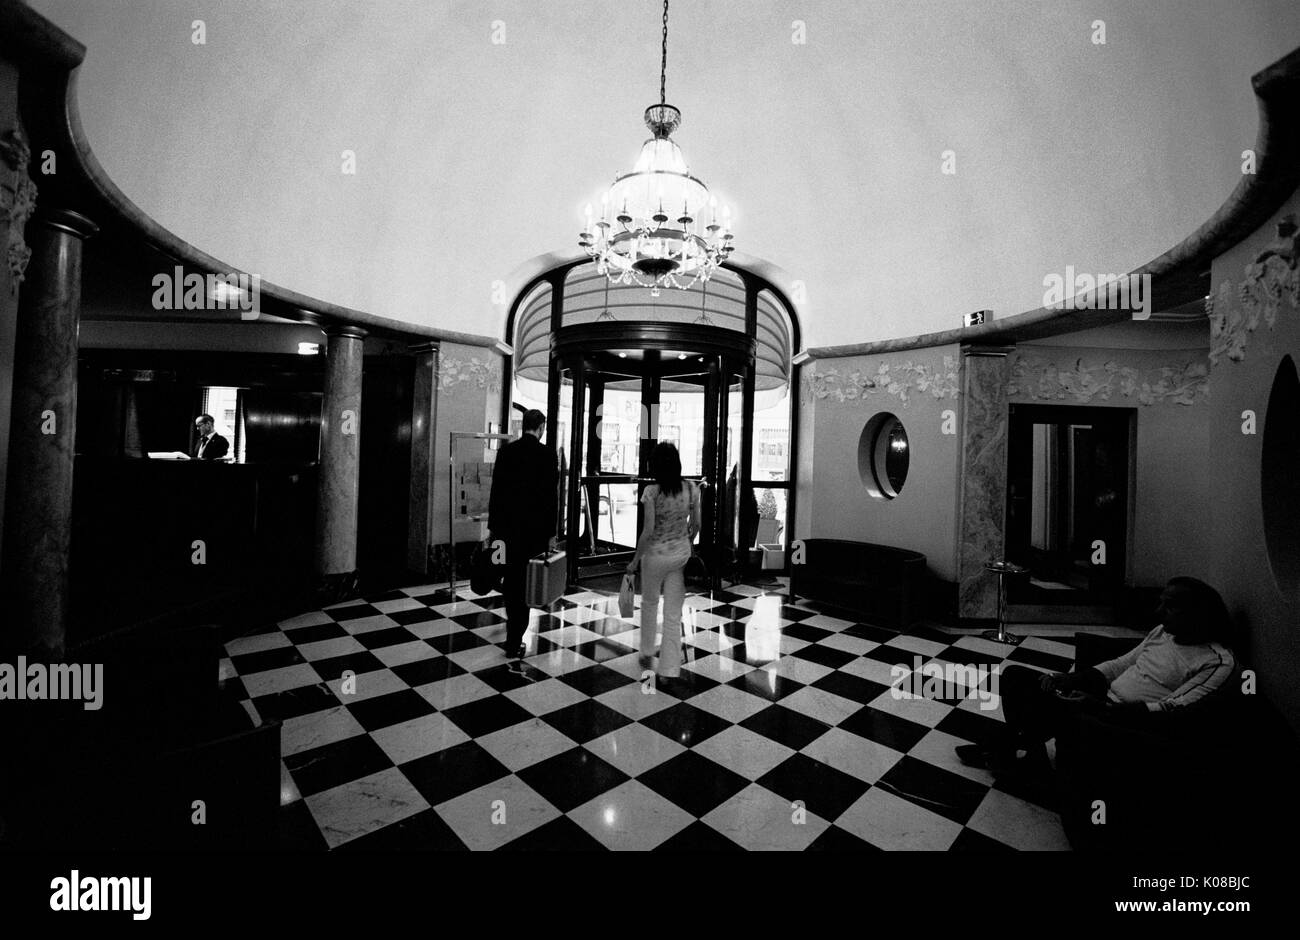 Paris Hotel Lutetia Built In 1910 Art Nouveau And Art Deco Period Stock Photo Alamy